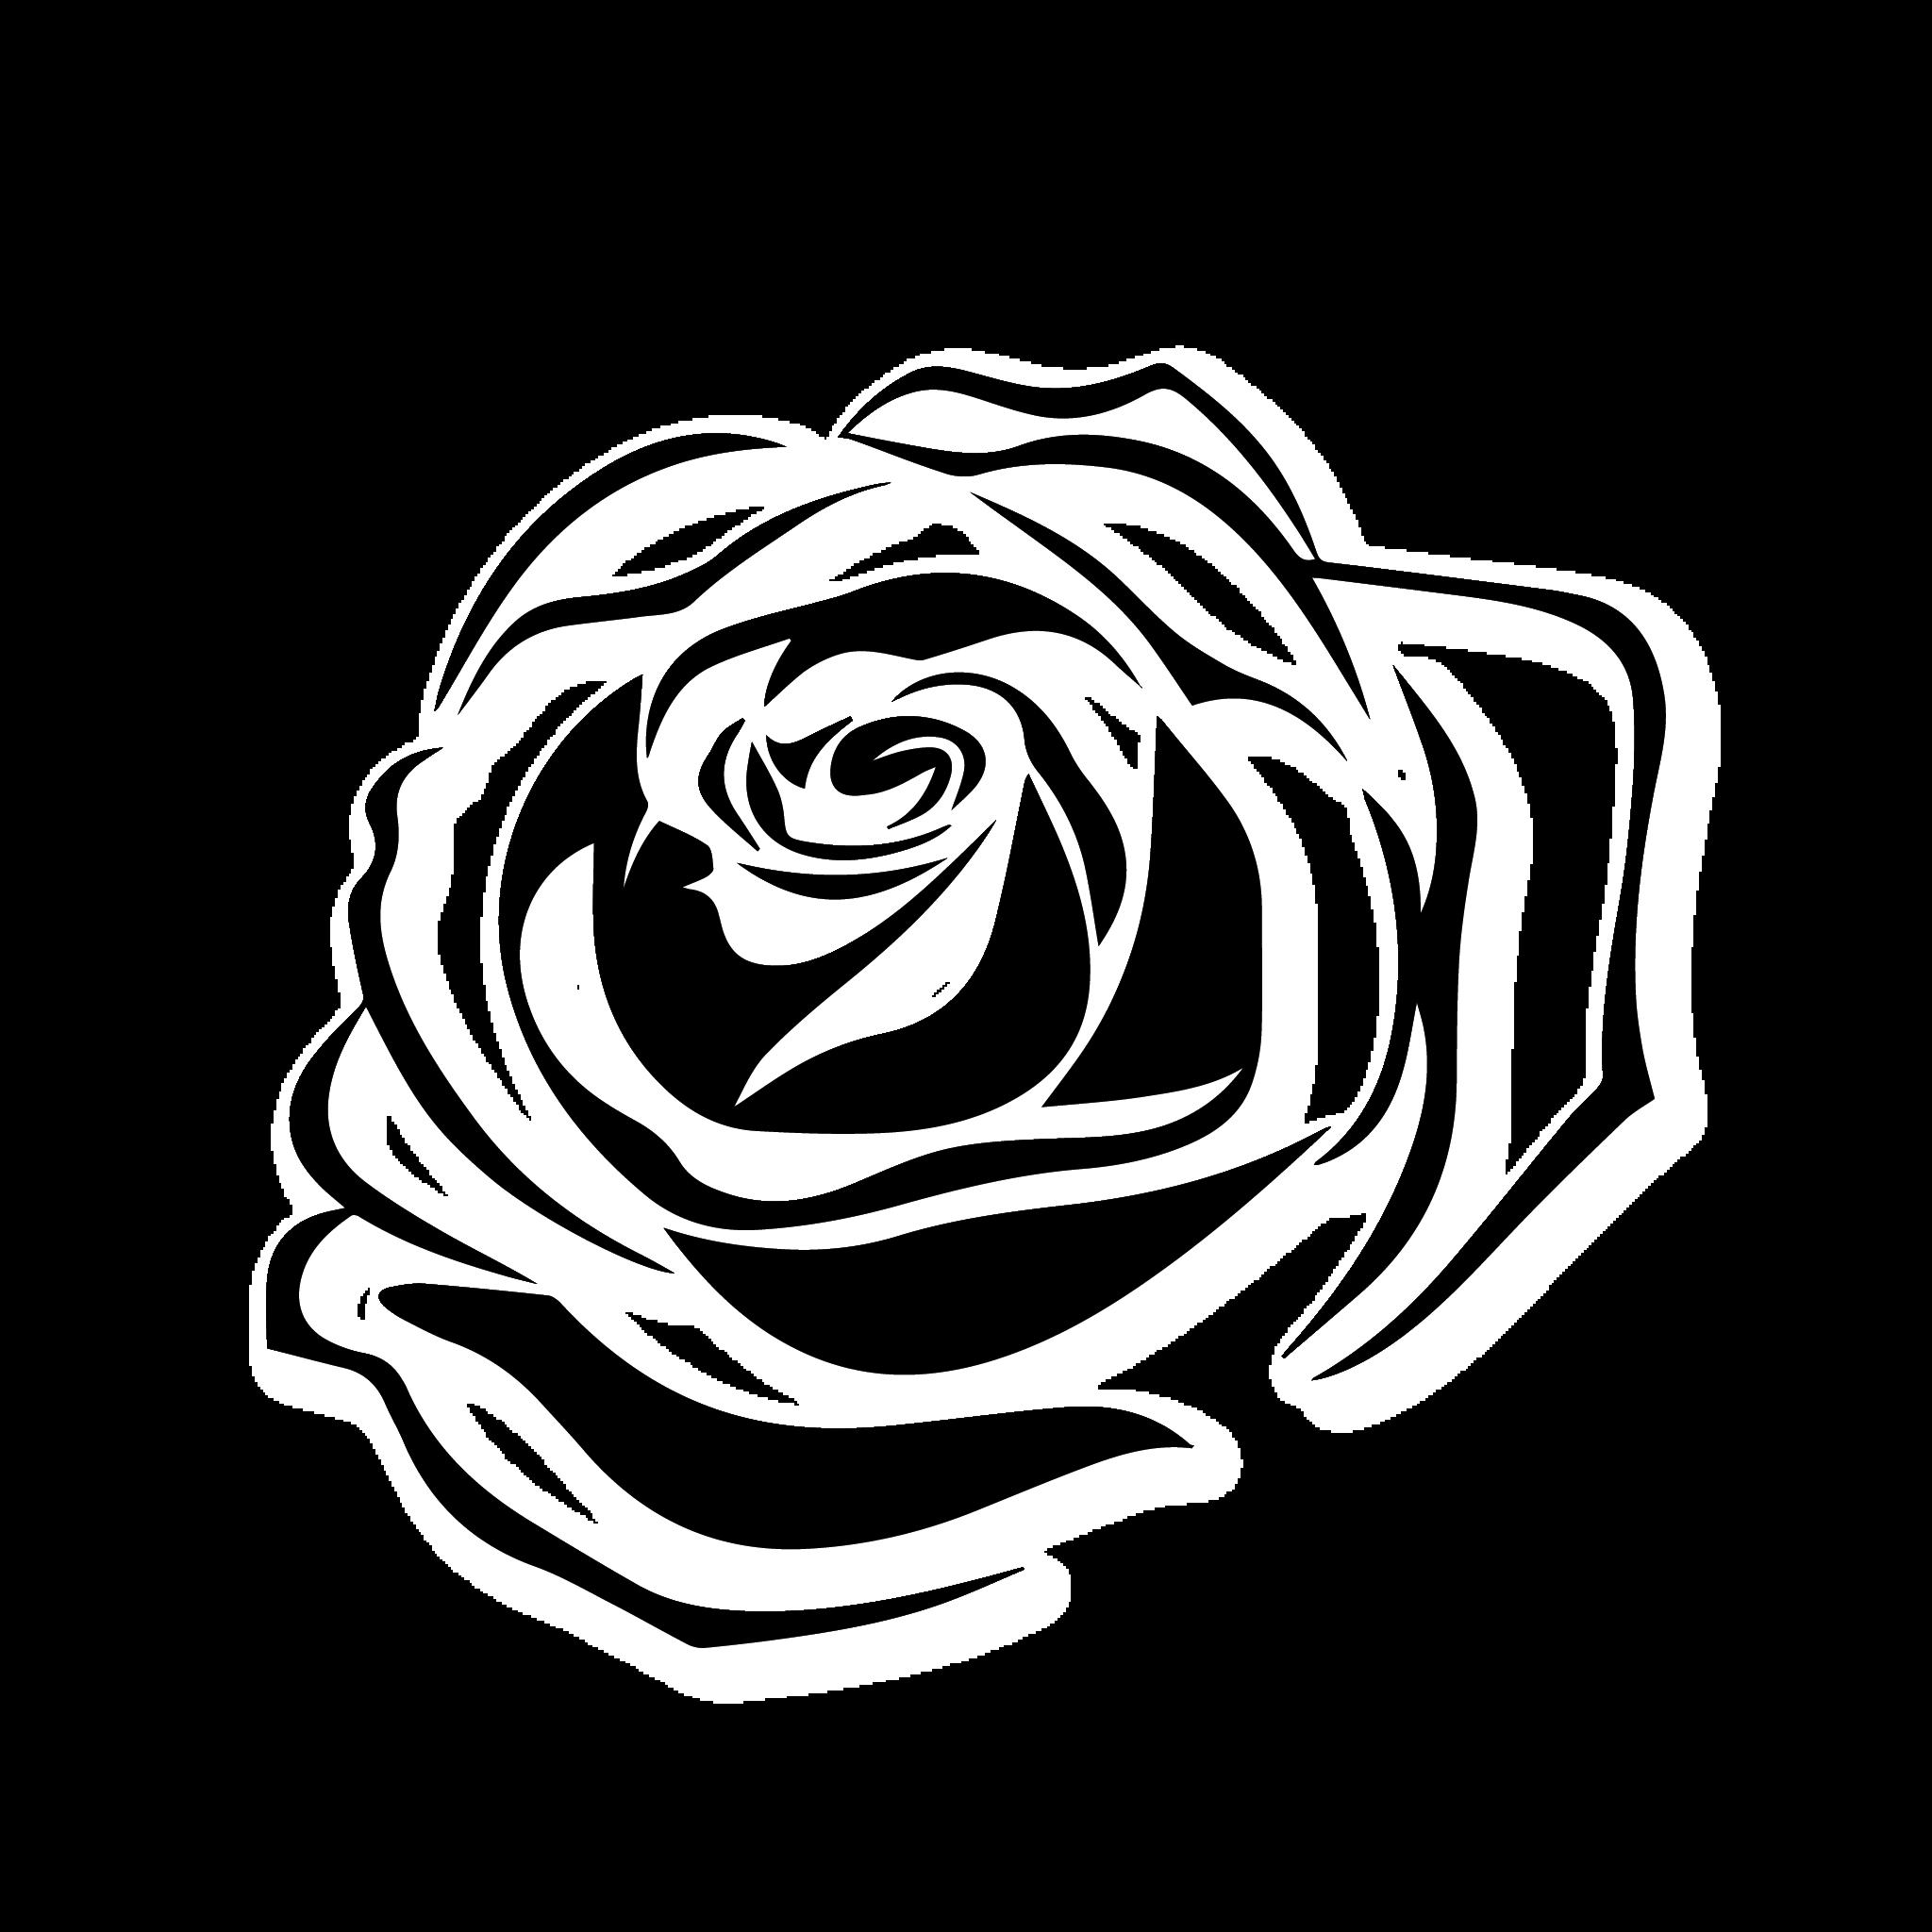 Download Free png Image Purpose Singles sticker rose tattoo.